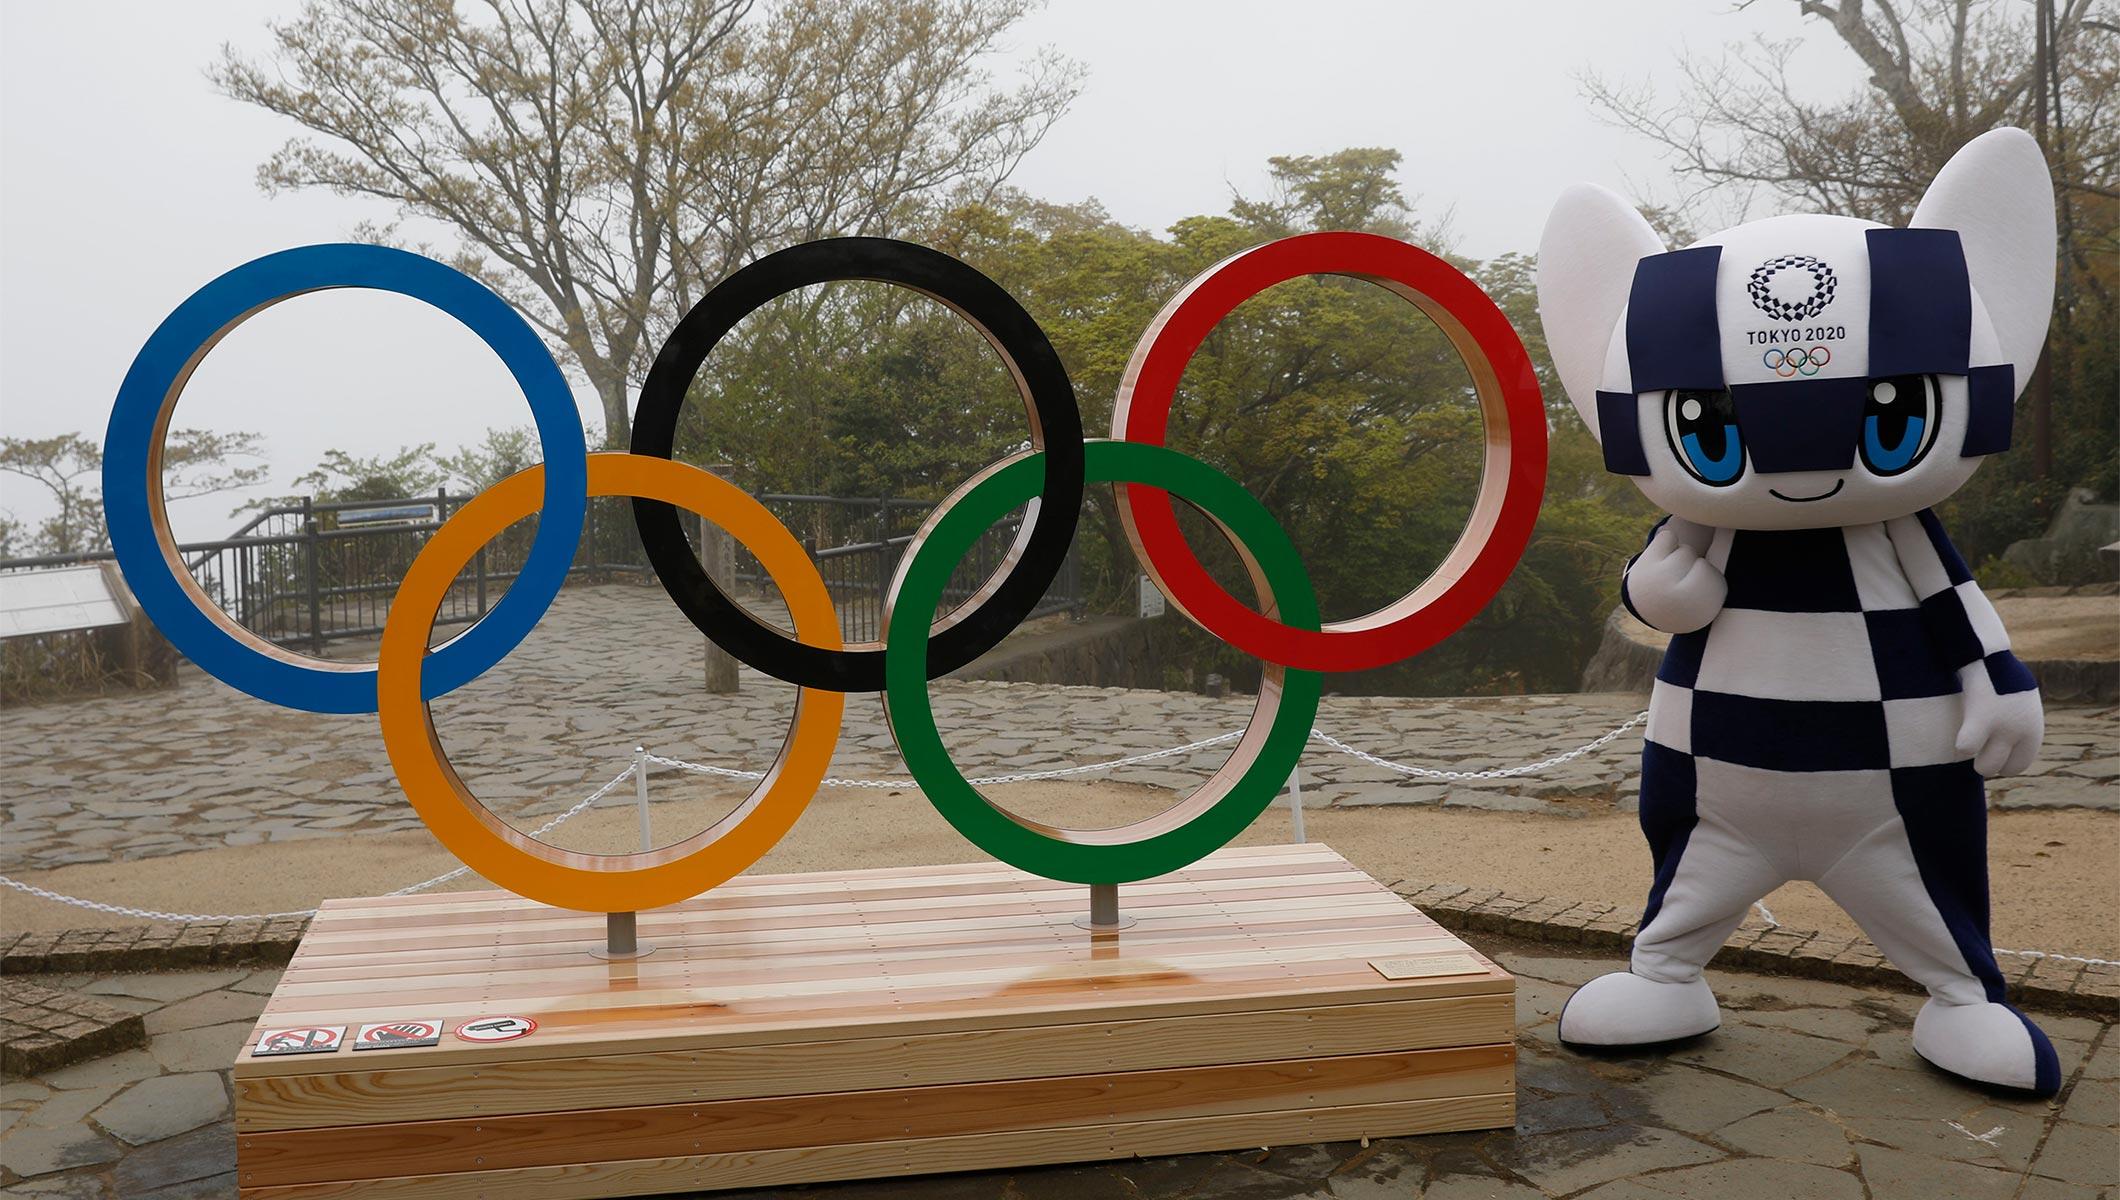 Tokyo 2020 mascot